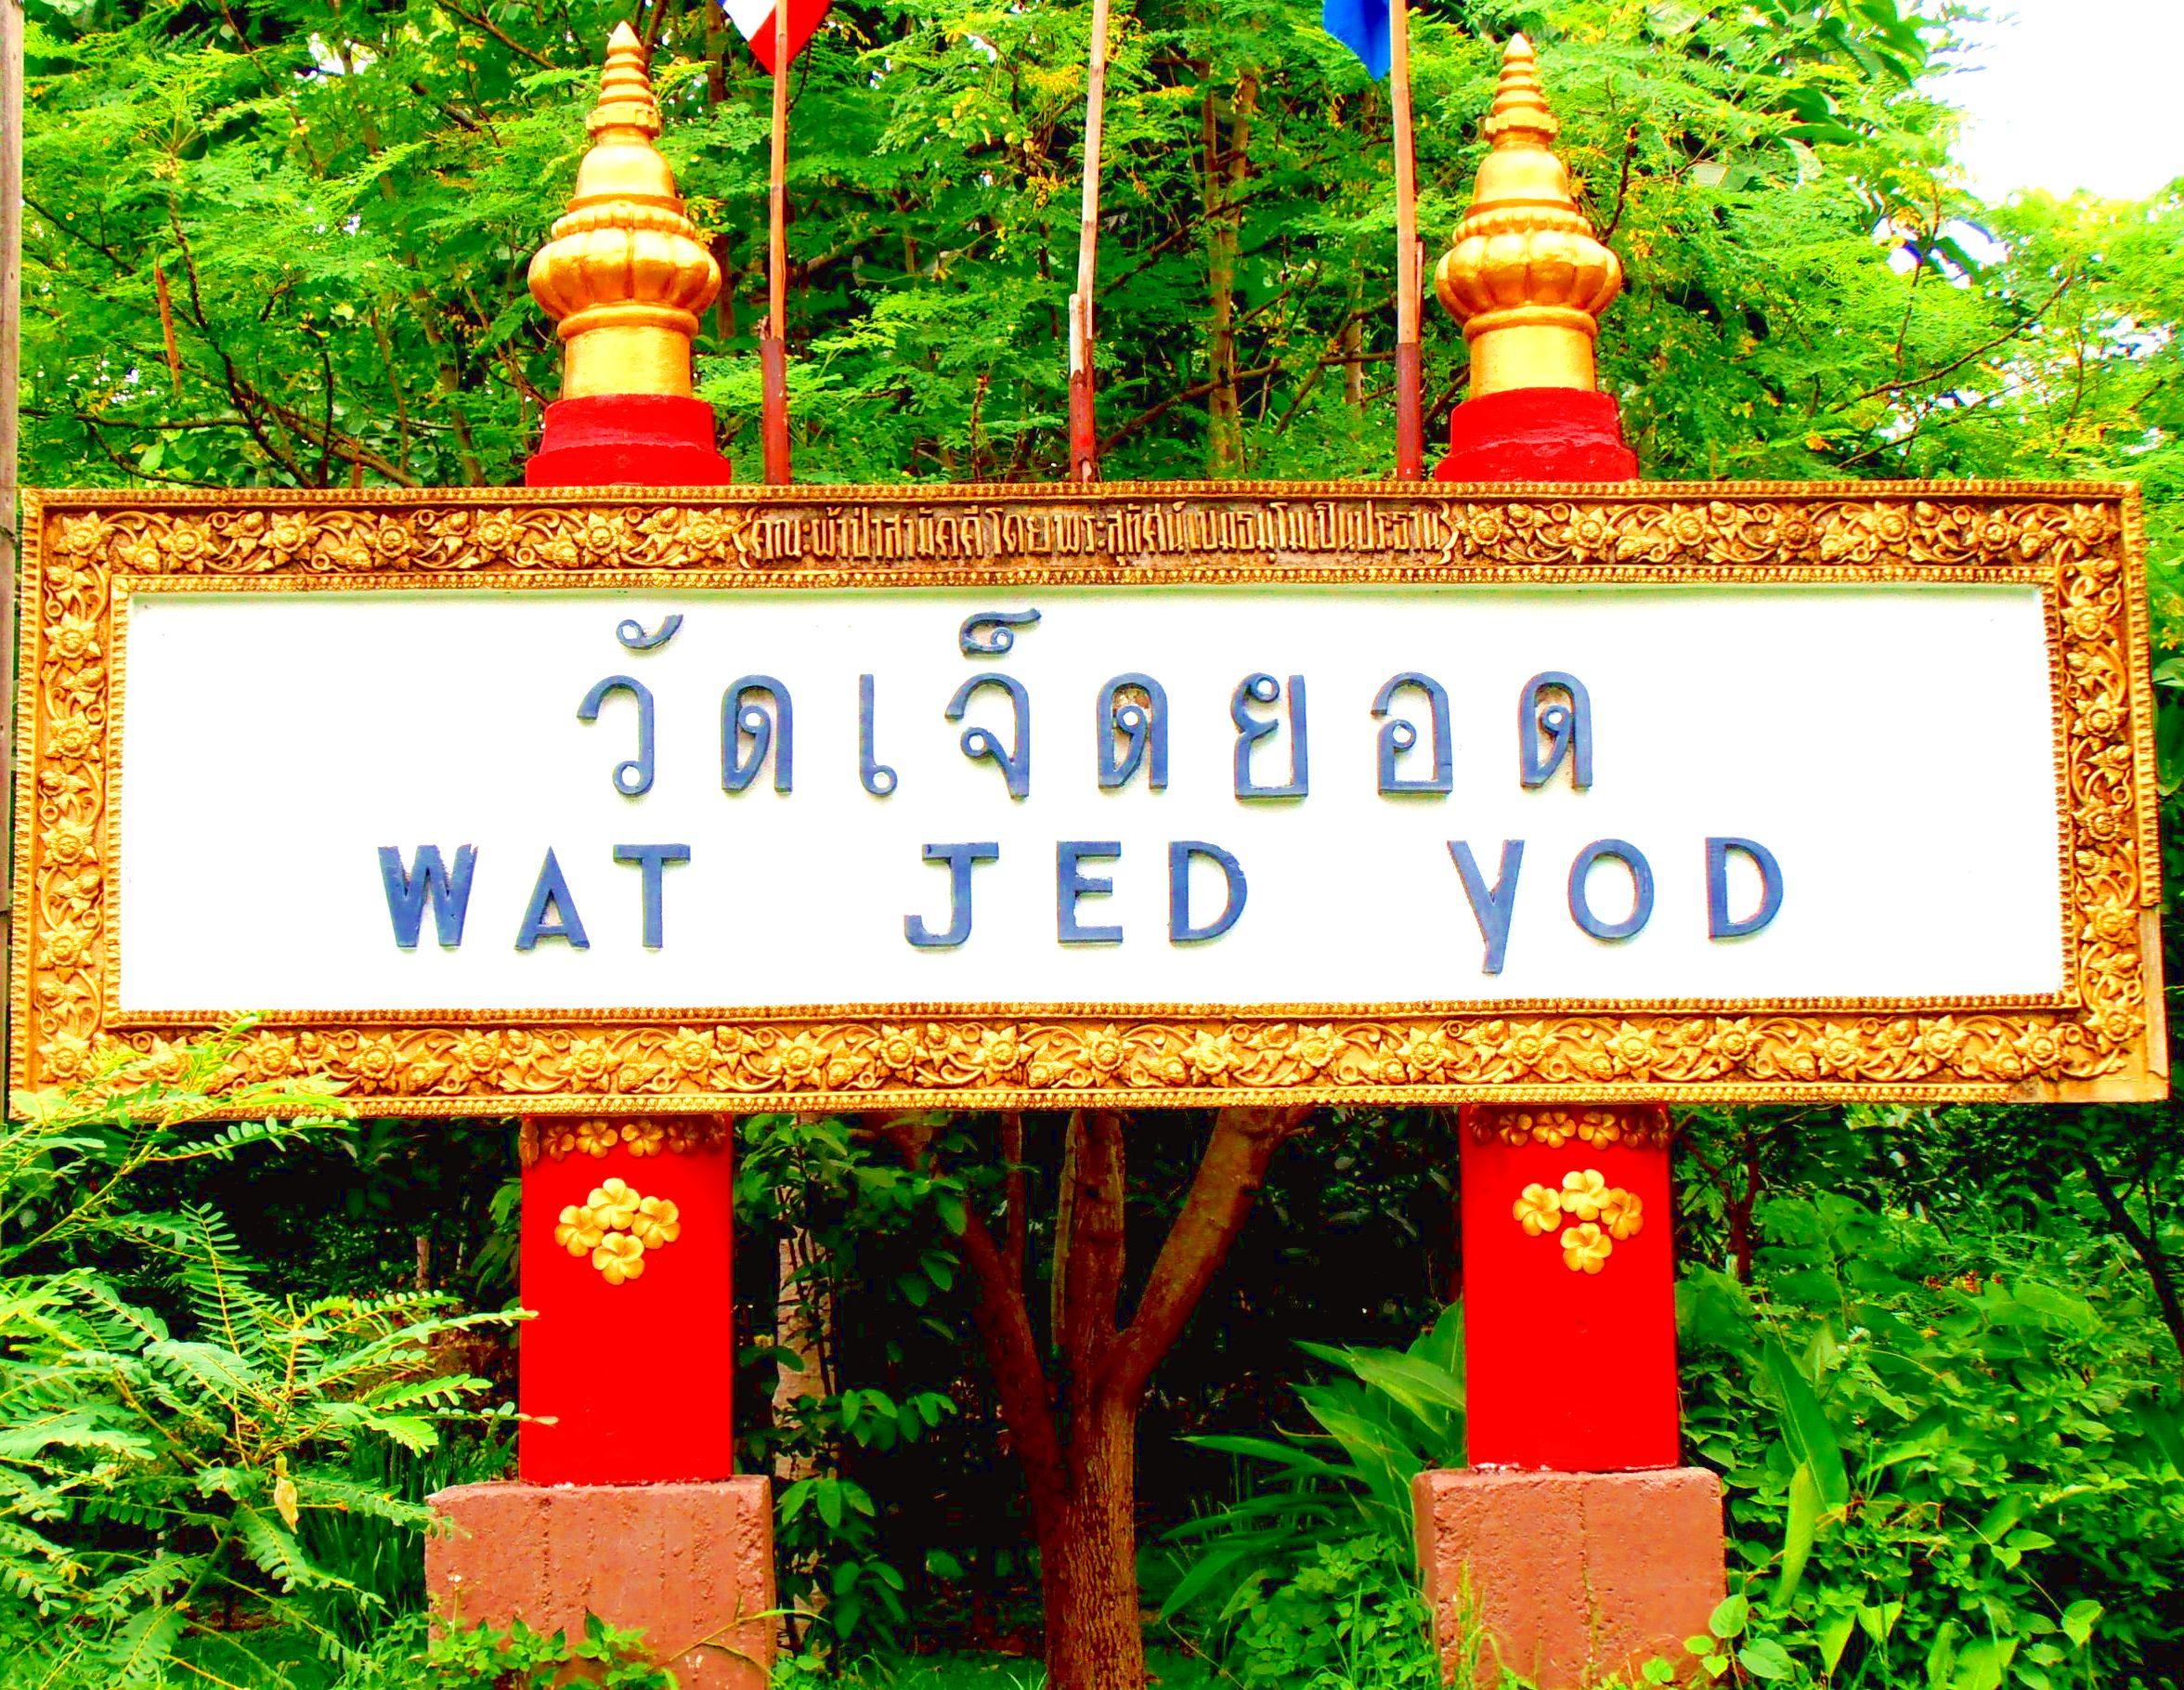 Chiang Mai Thailand Wat Ched Yod